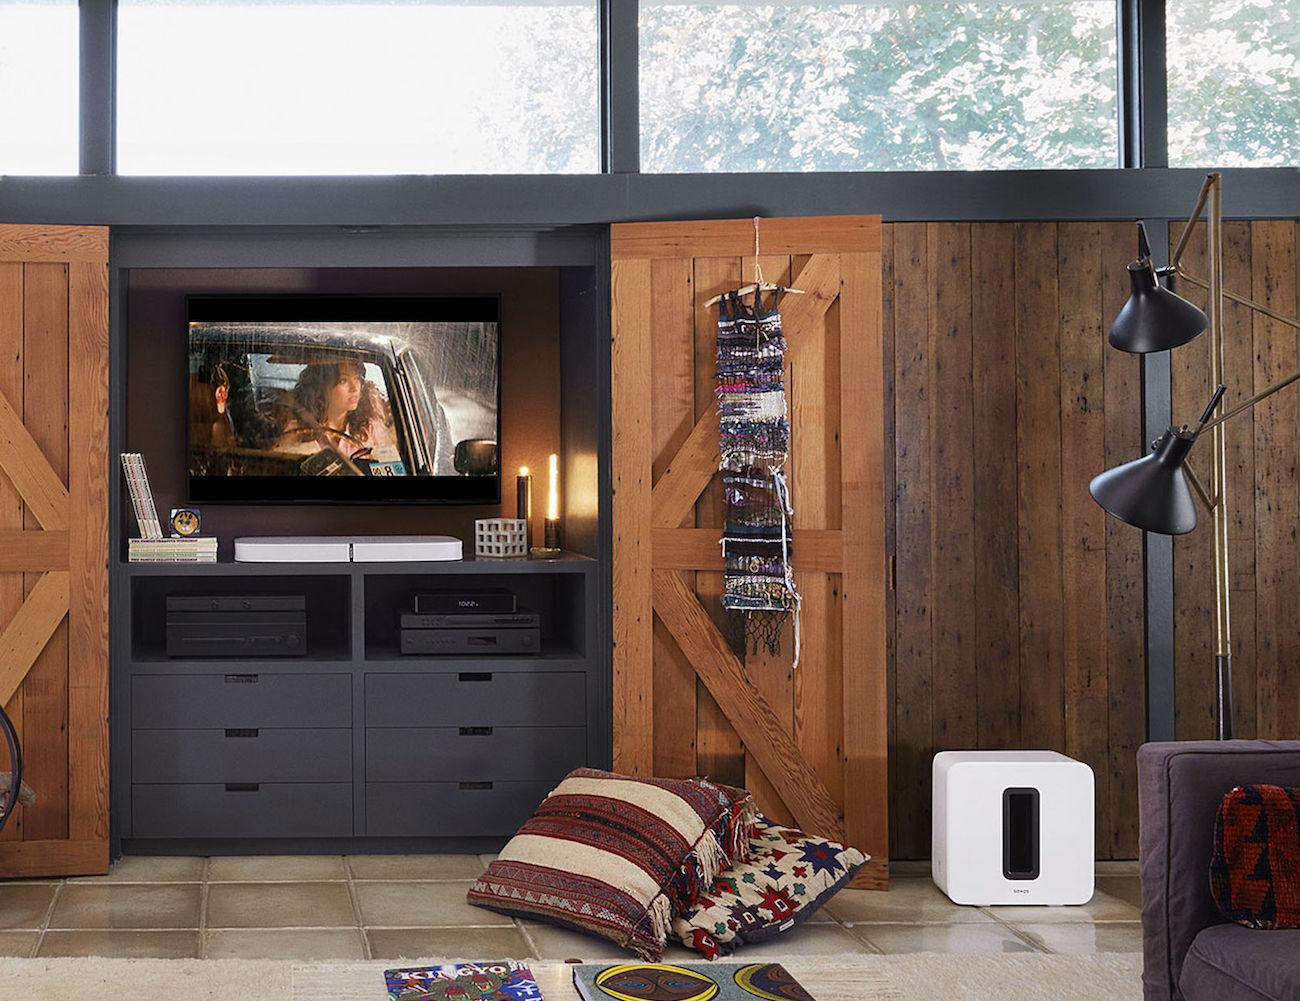 Sonos Playbase Wireless Soundbase Speaker